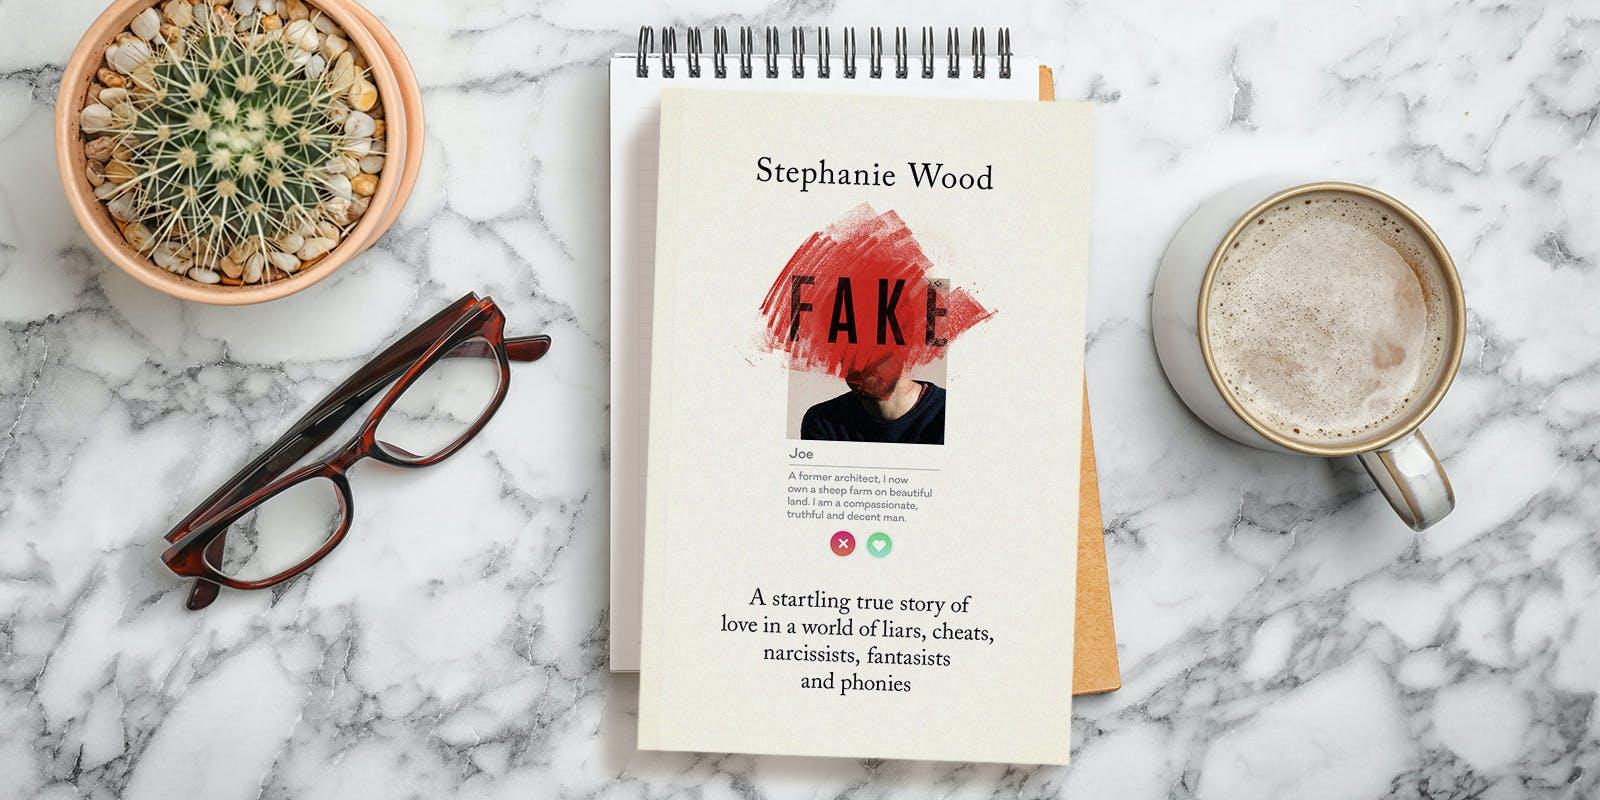 Fake by Stephanie Wood - Penguin Books Australia